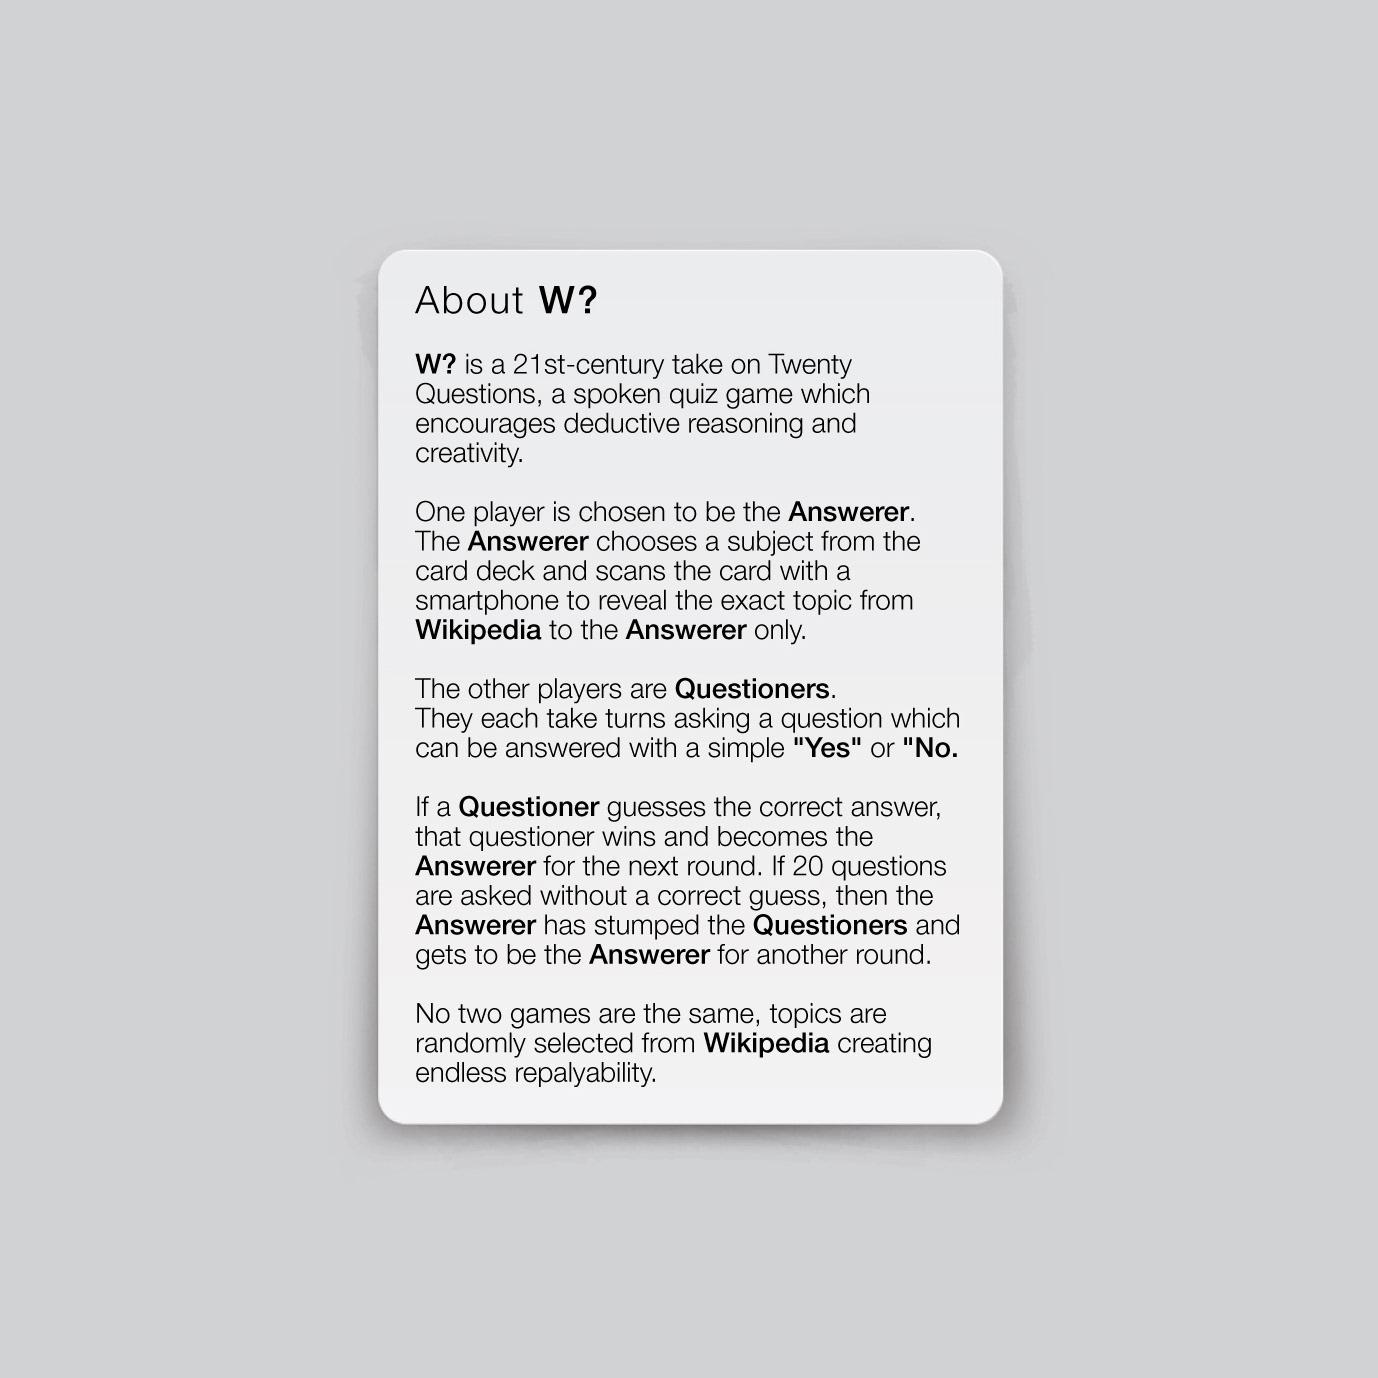 Mirko Arico-Torreno - Wikipedia Twenty Questions